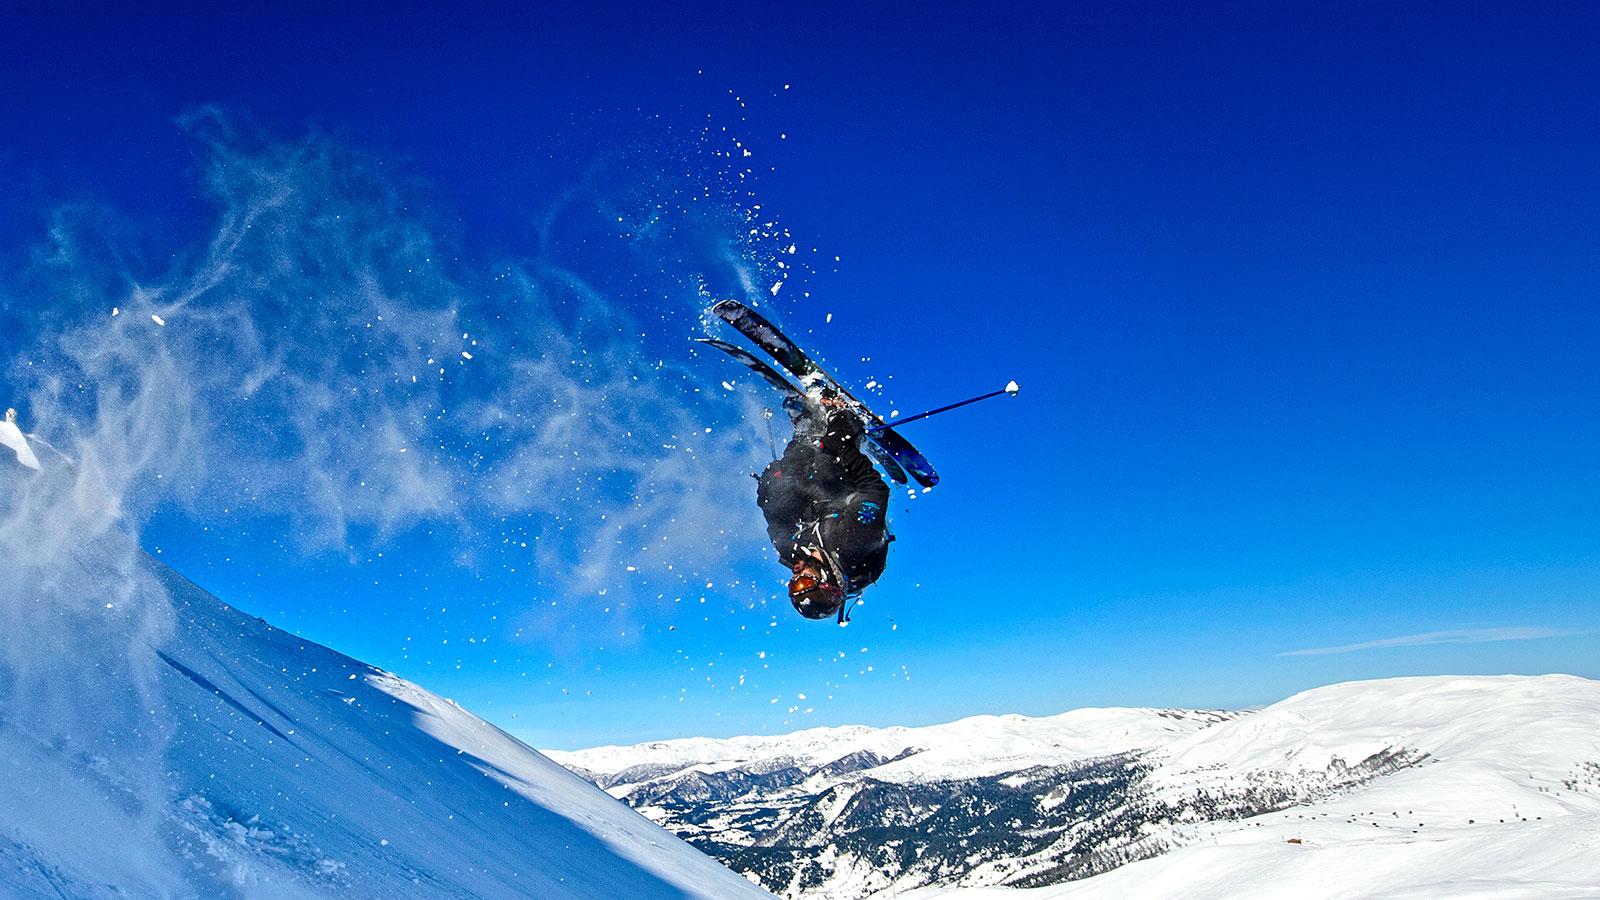 Sniegotais Goderdzi kalnu kūrorts